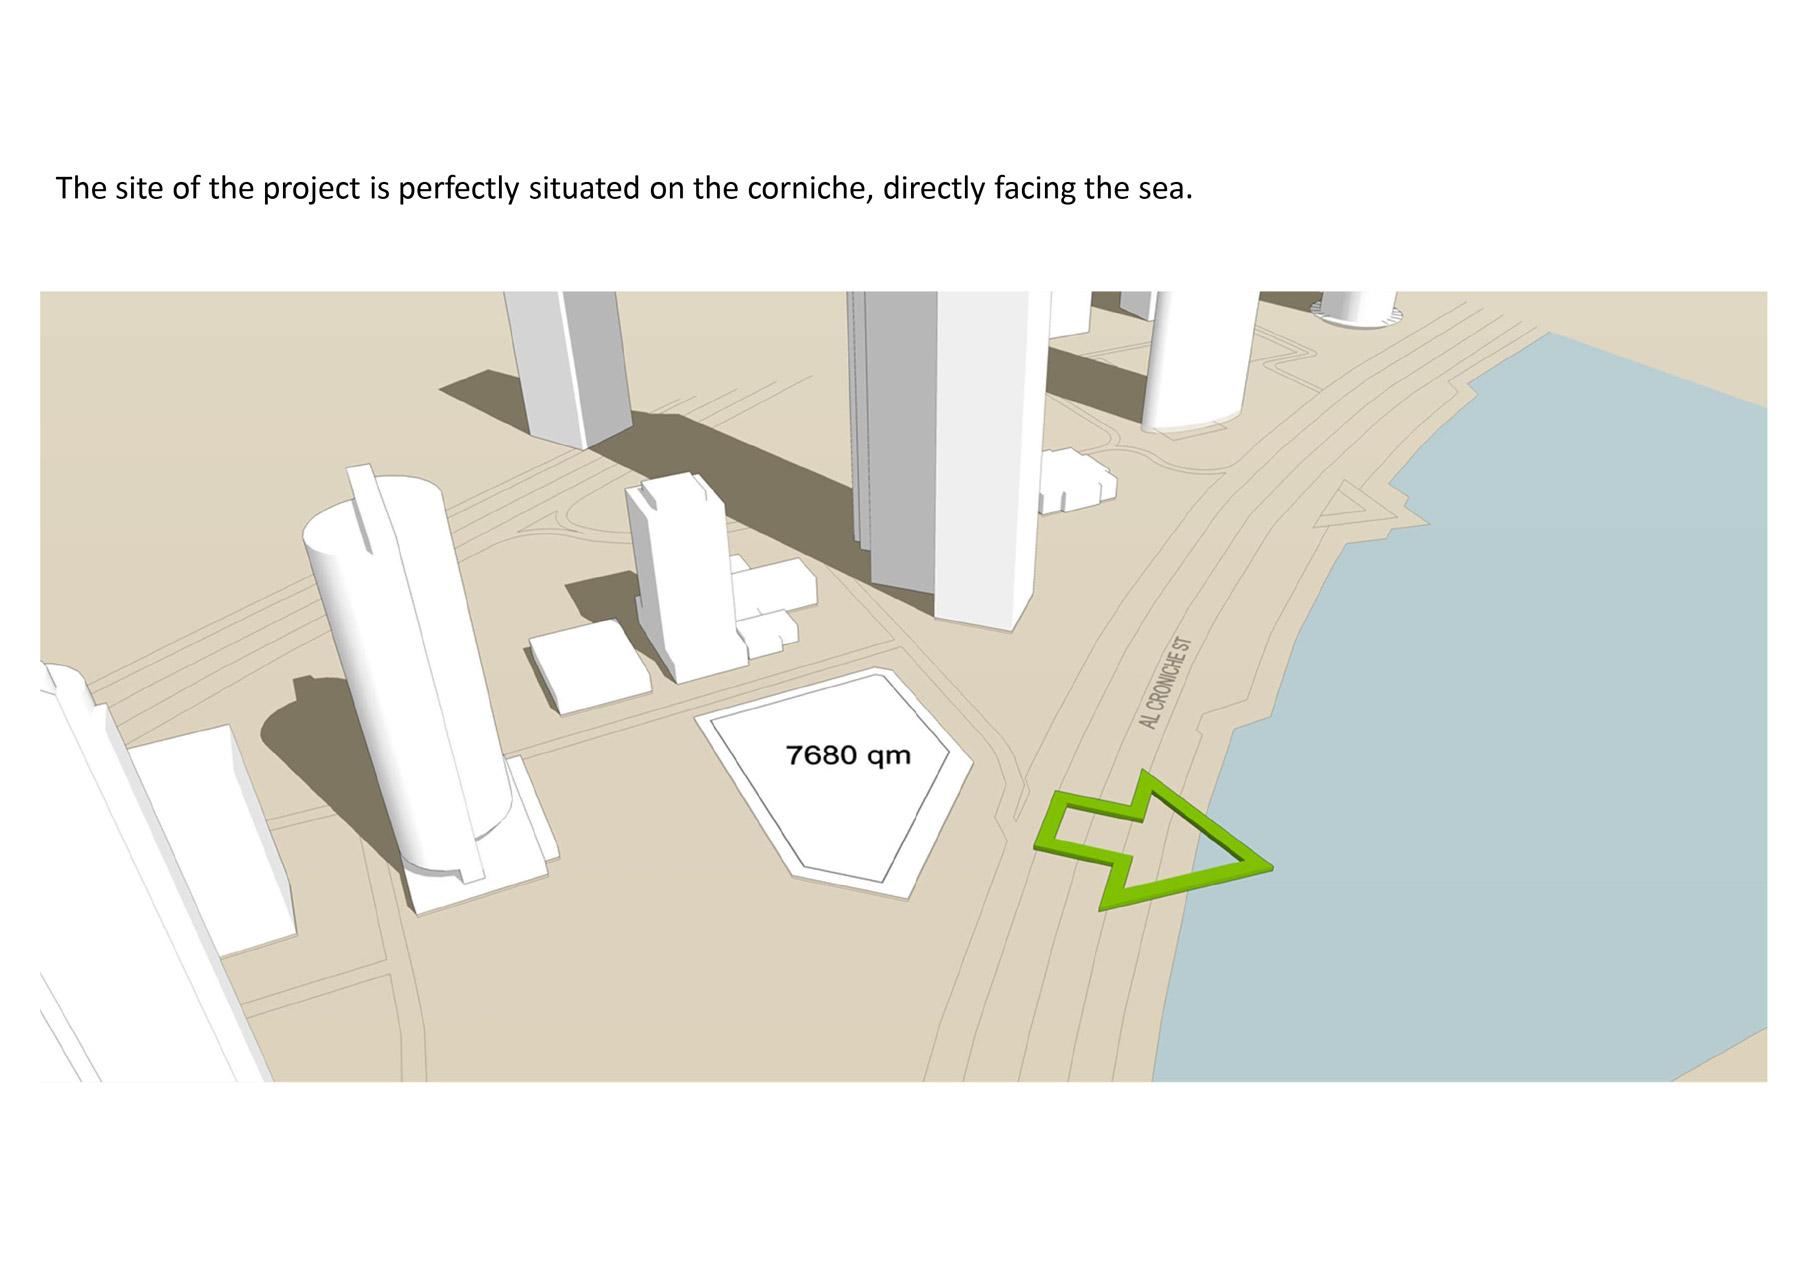 160_Qatar_Corniche_Slide_04